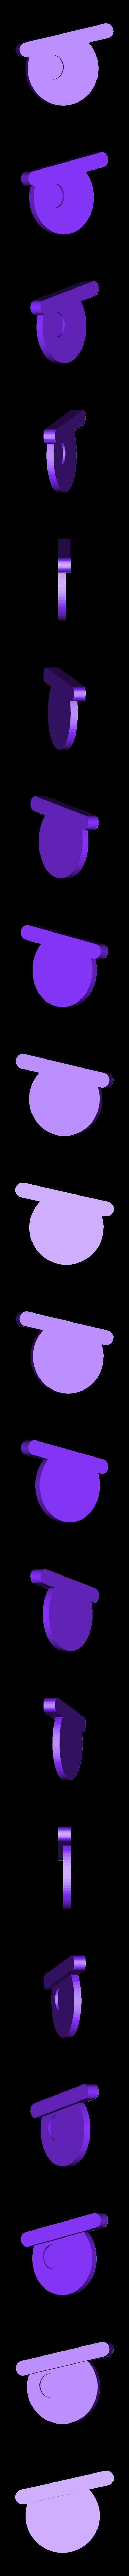 Color 2.2.stl Download free STL file Keychain Multicolor Hulk • 3D printer design, dukedoks